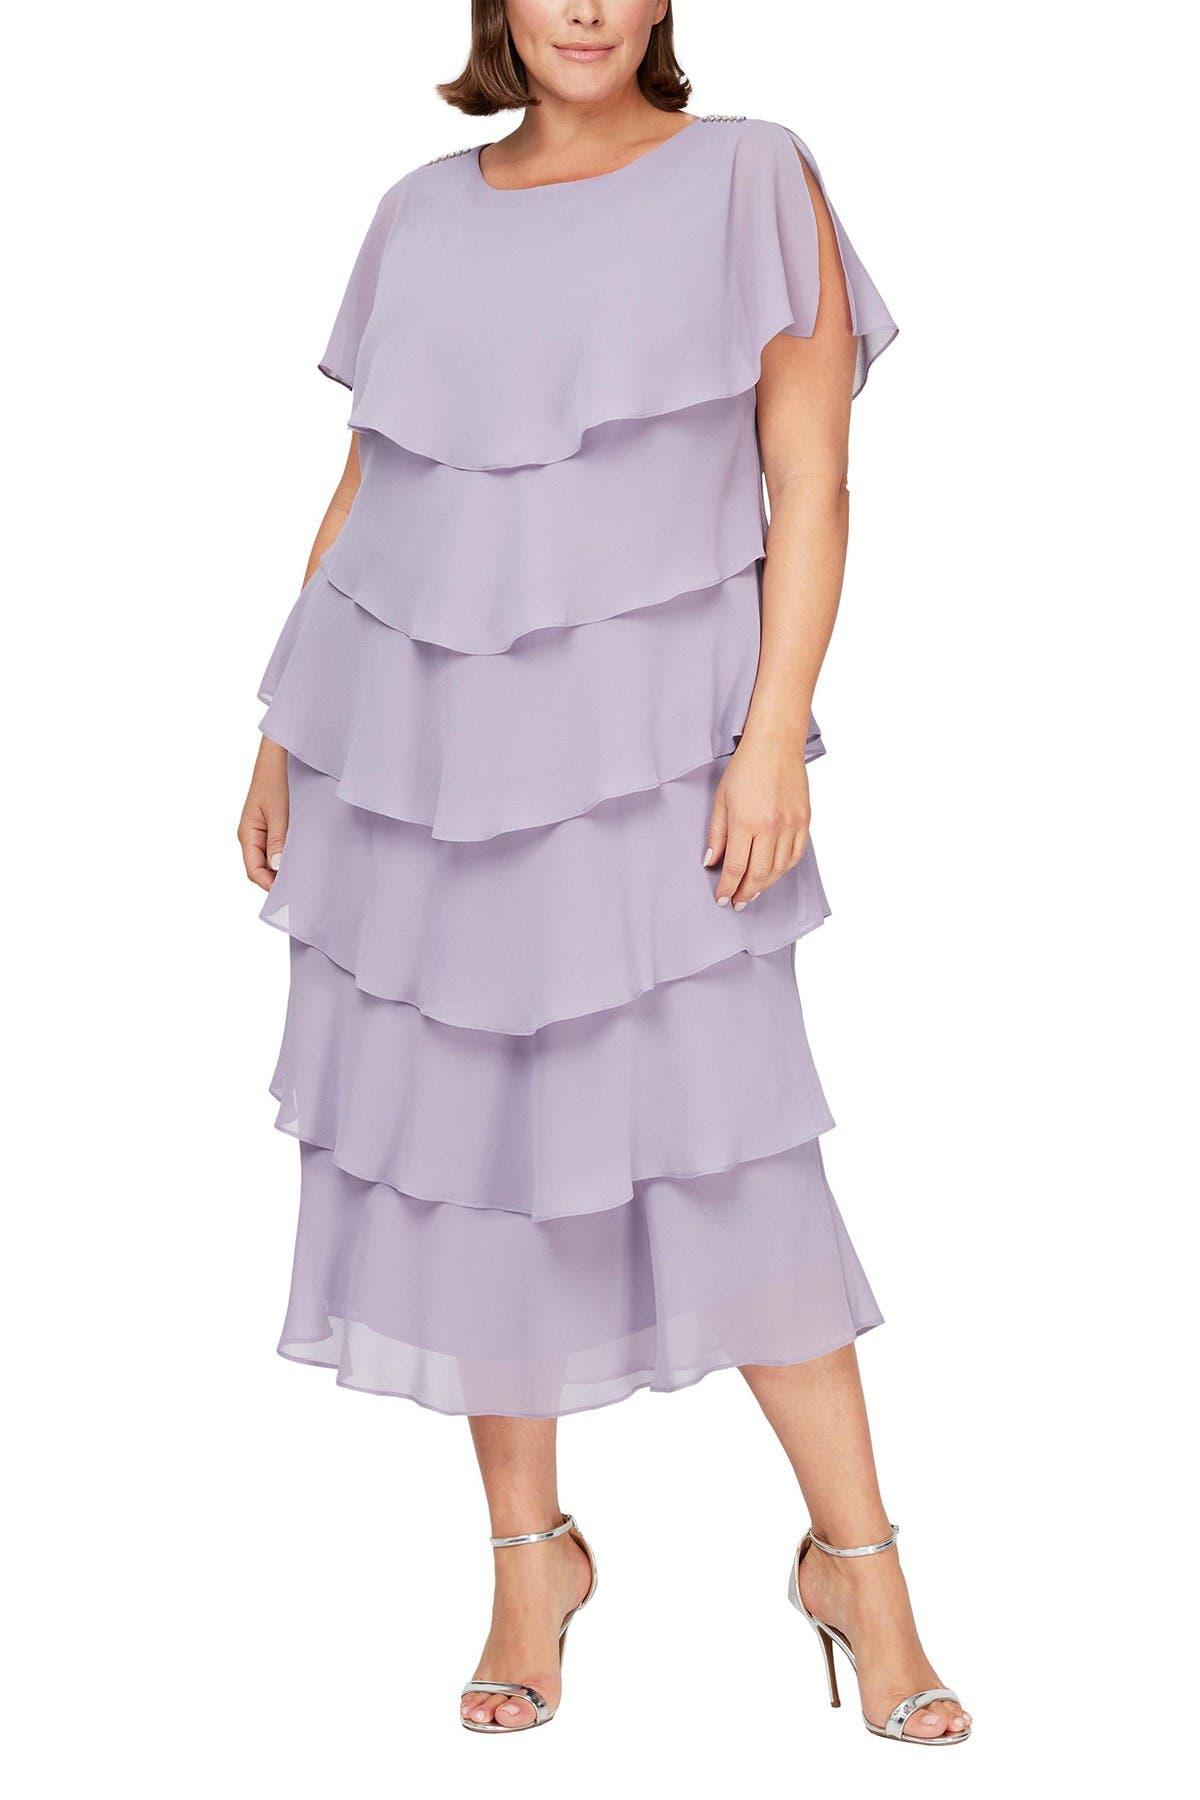 Image of SLNY Tiered Chiffon Midi Dress